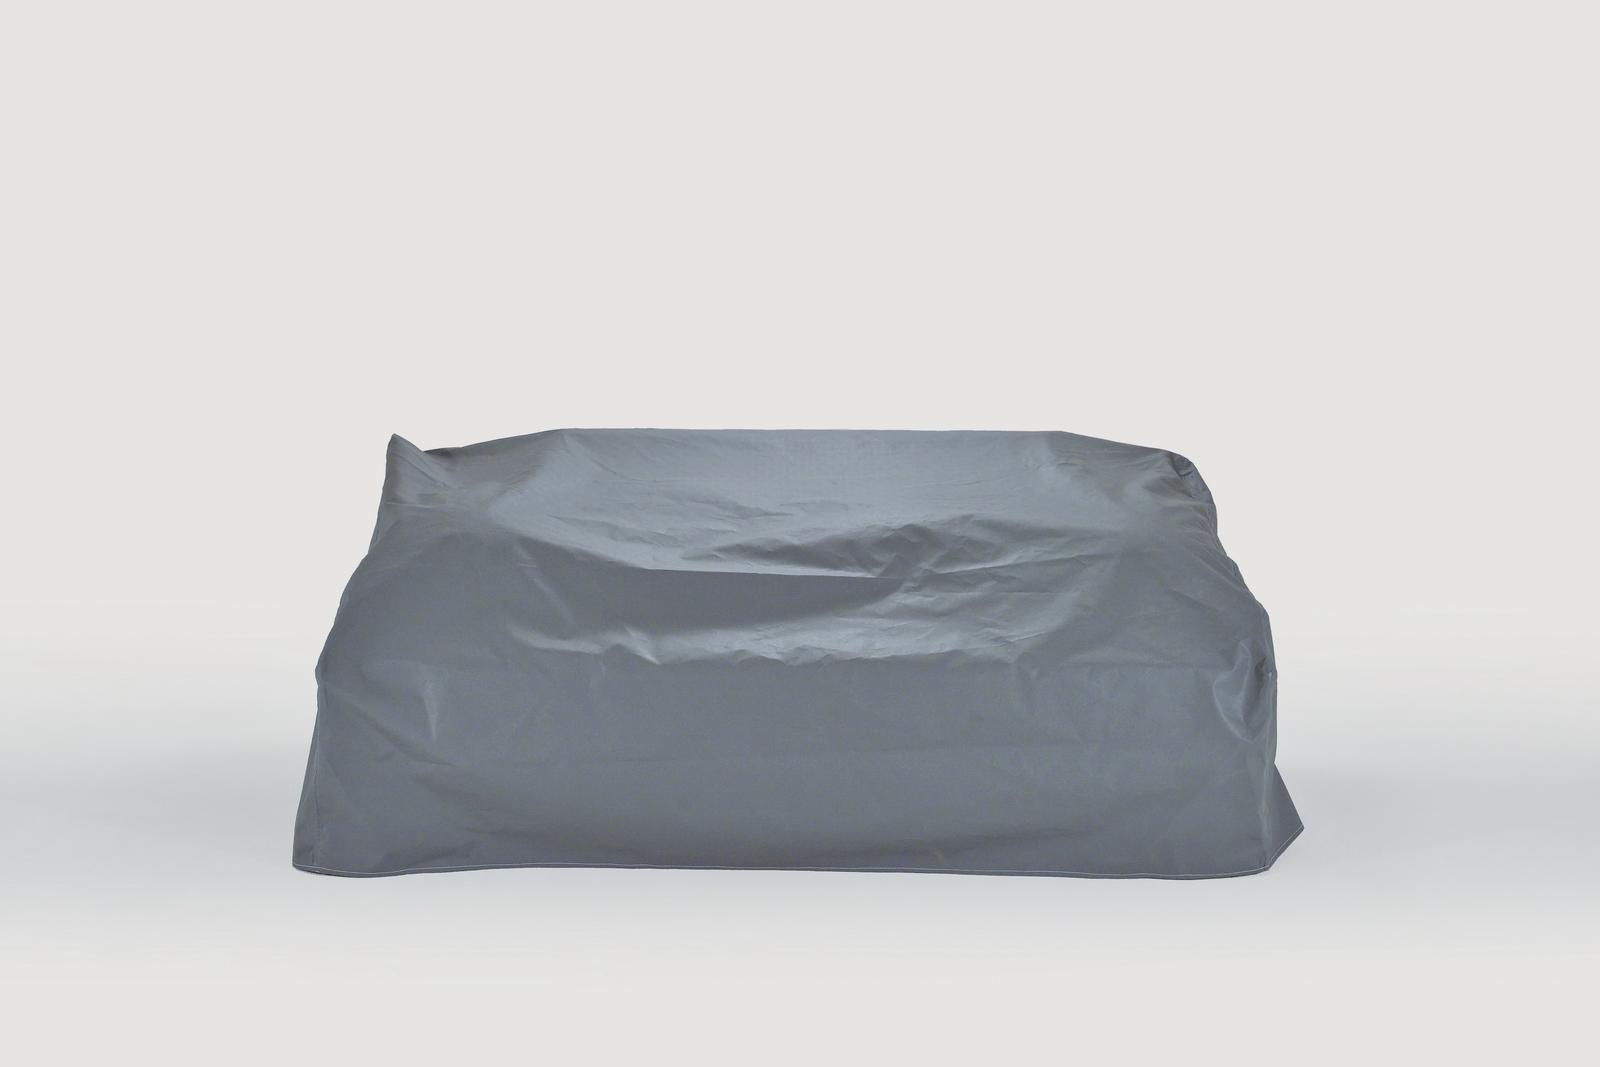 PTendercool-Ourdoor-Sofa-PT71(x2)-BS1-TE-DO-Palm Plain (Henna)-191101-10